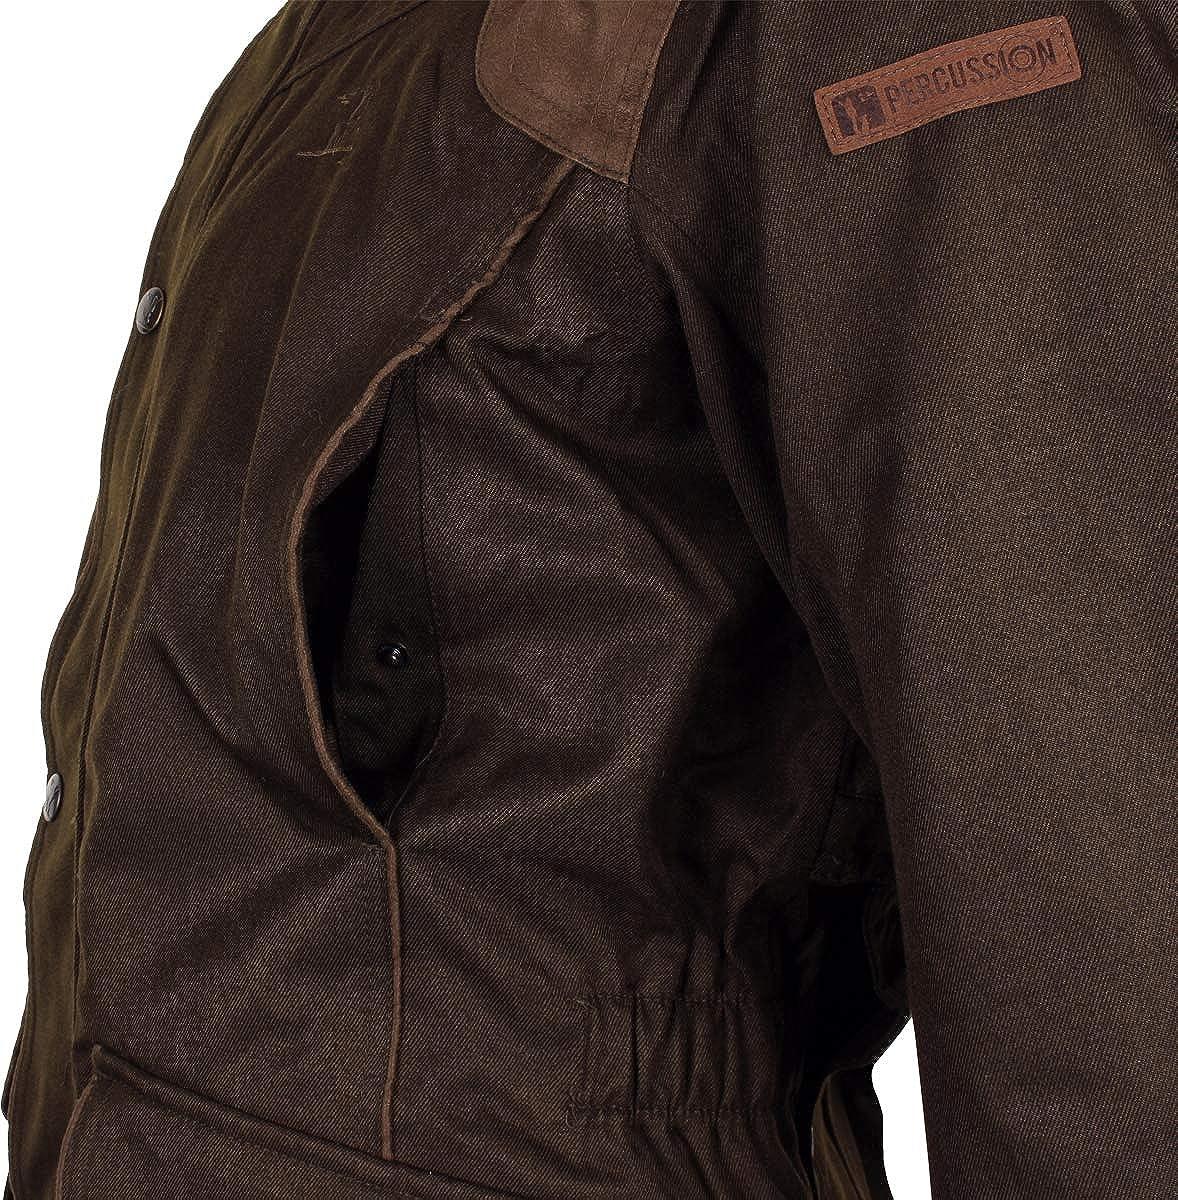 New Percussion Kid/'s Sologne Skintane  Waterproof Hunting Jacket Shooting Coat